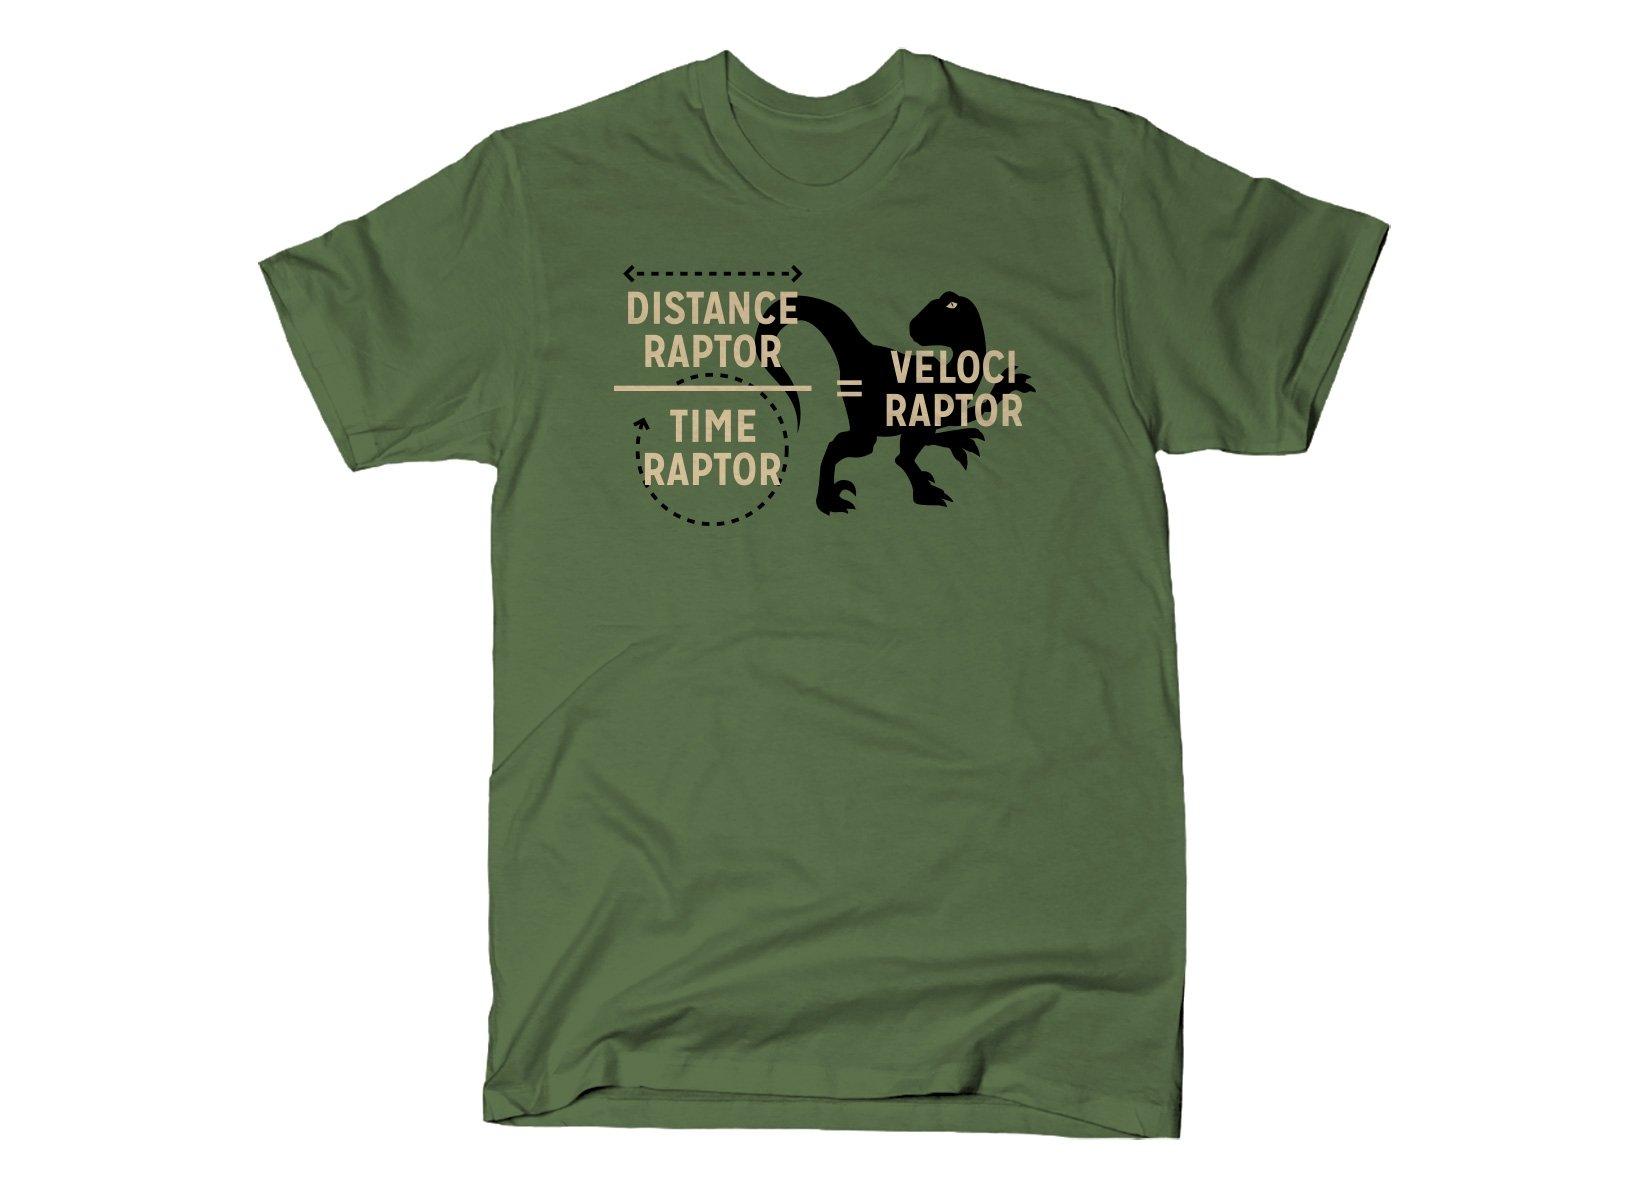 Veloci Raptor on Mens T-Shirt